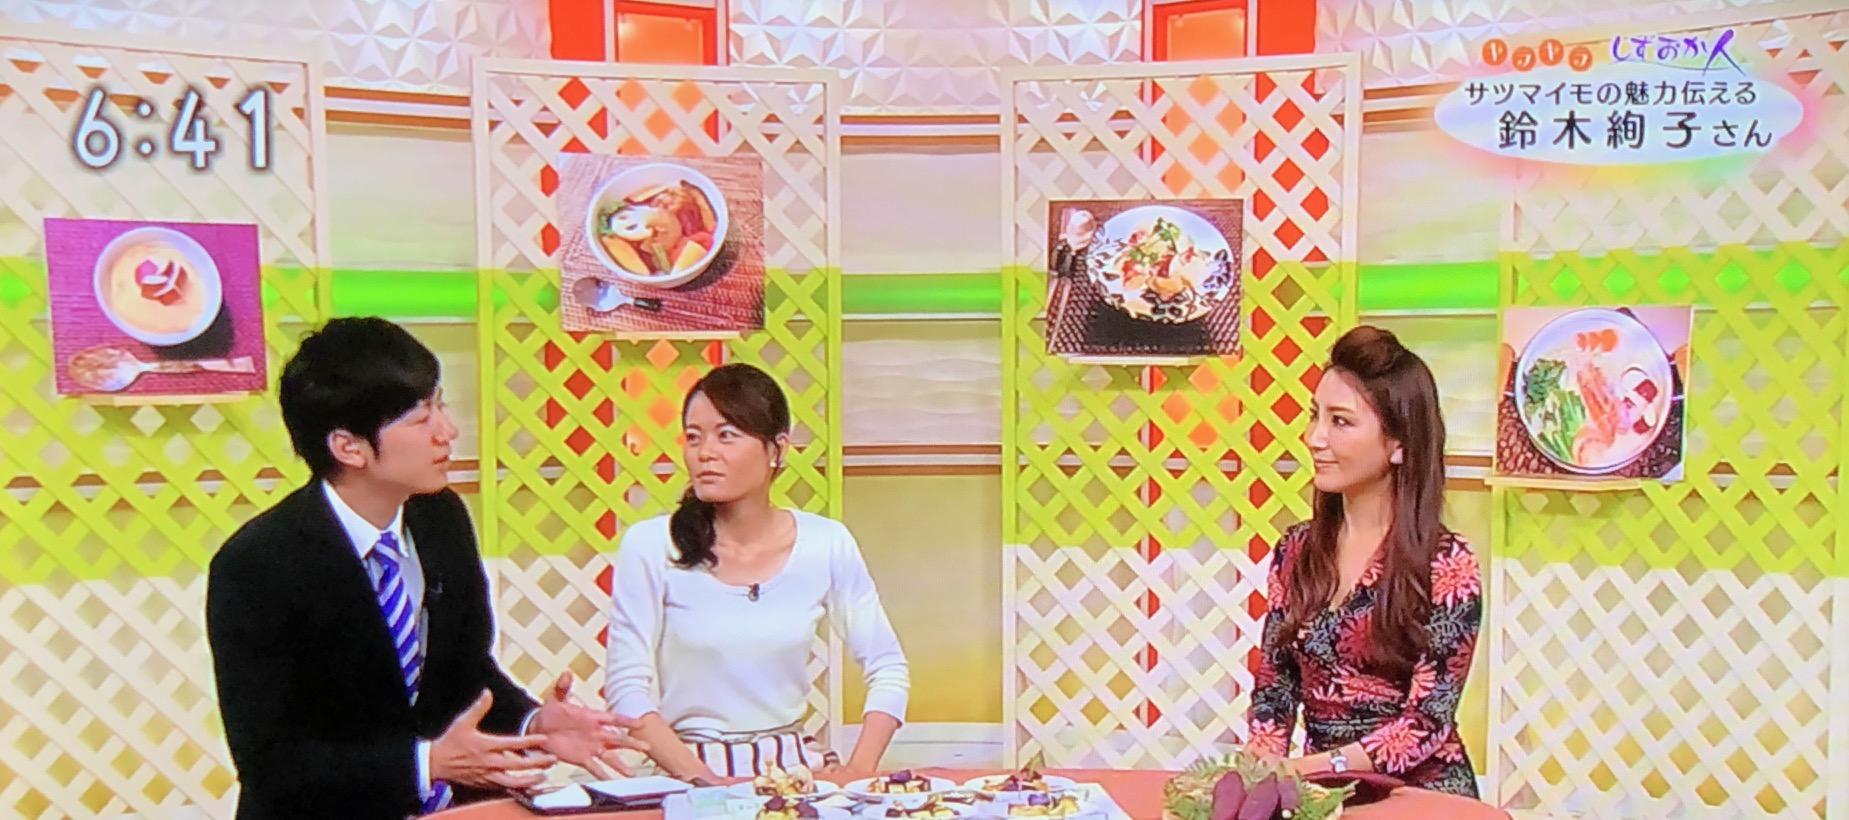 NHK静岡放送 「たっぷり静岡」